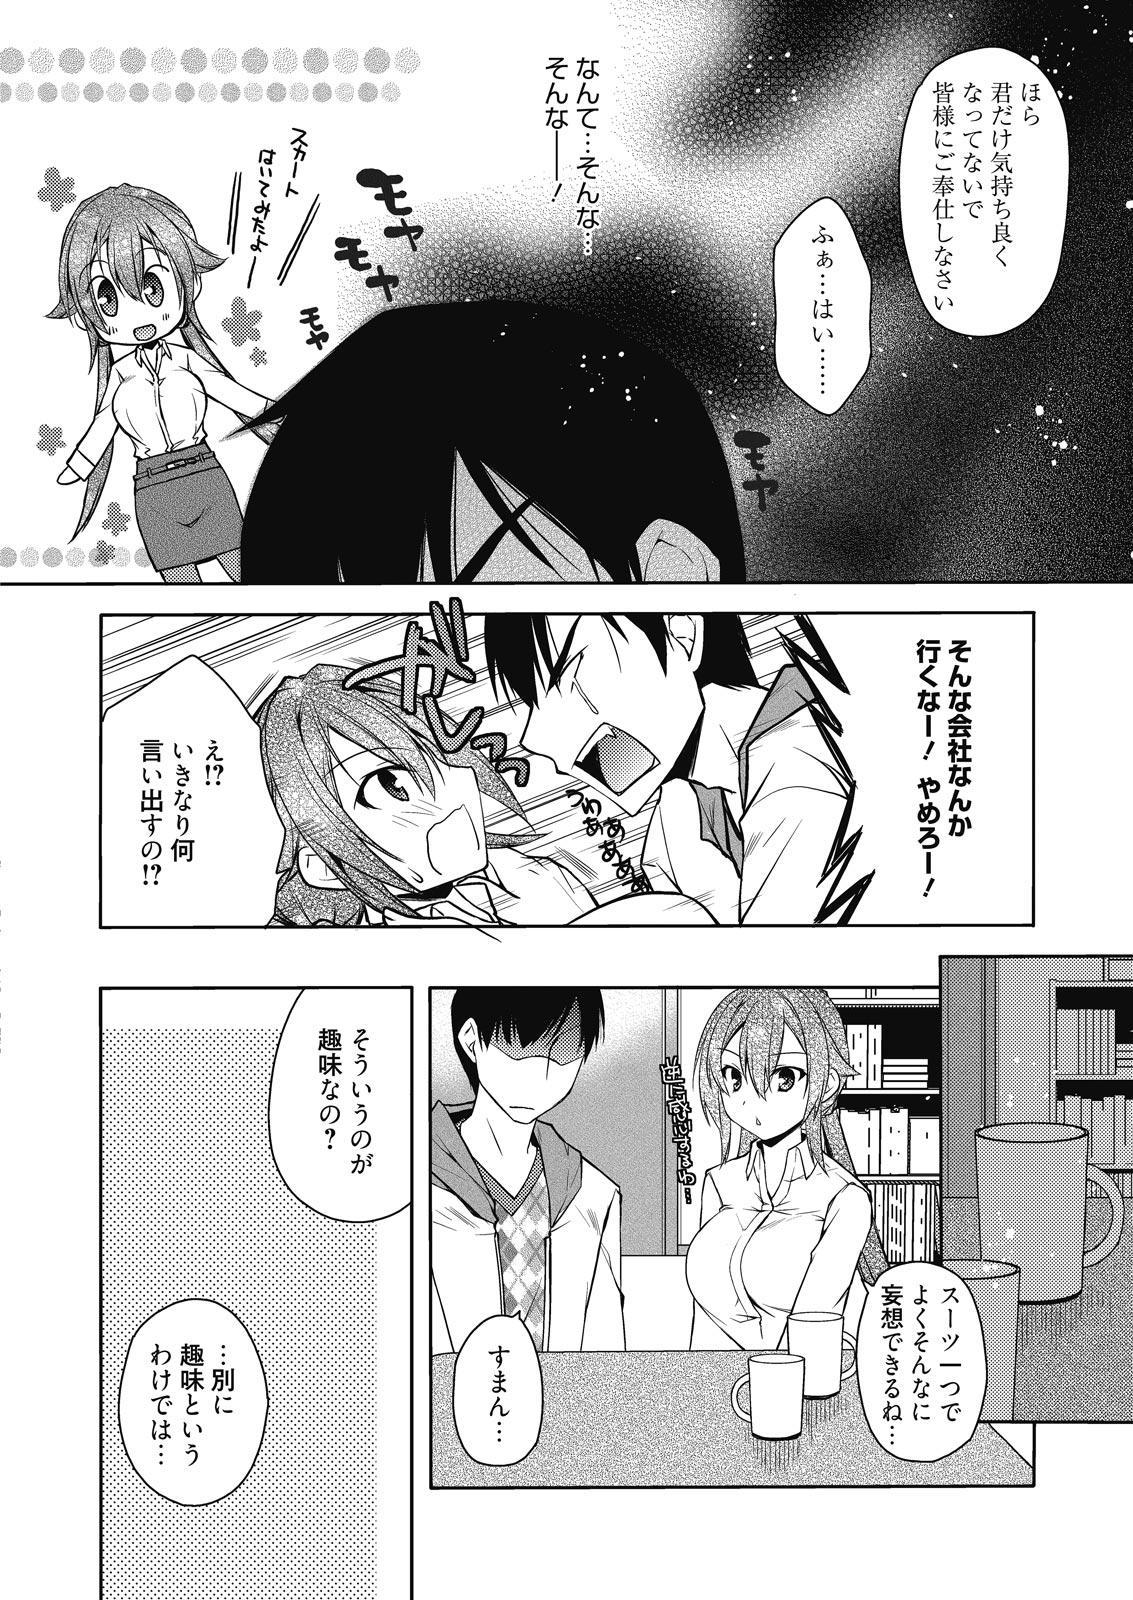 Web Manga Bangaichi Vol. 7 105